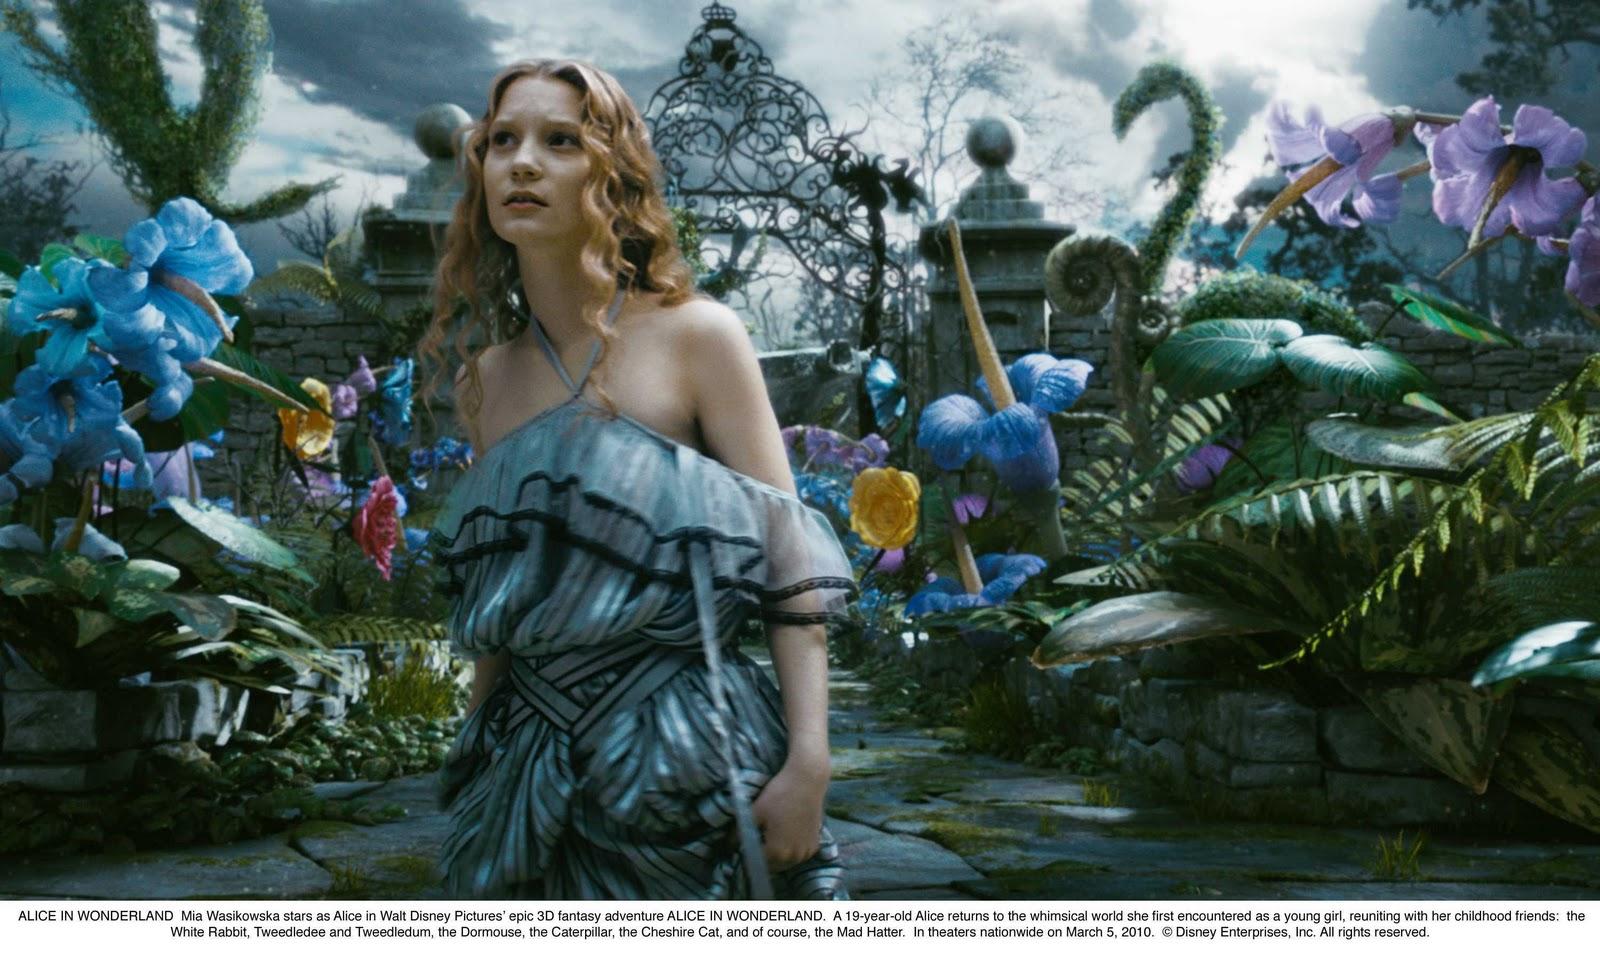 http://1.bp.blogspot.com/_2n9G8hS3AbI/TUt7_vk6V5I/AAAAAAAACE0/8f7hxJUENlI/s1600/Alice+in+Wonderland+New+Wallpaper.jpg